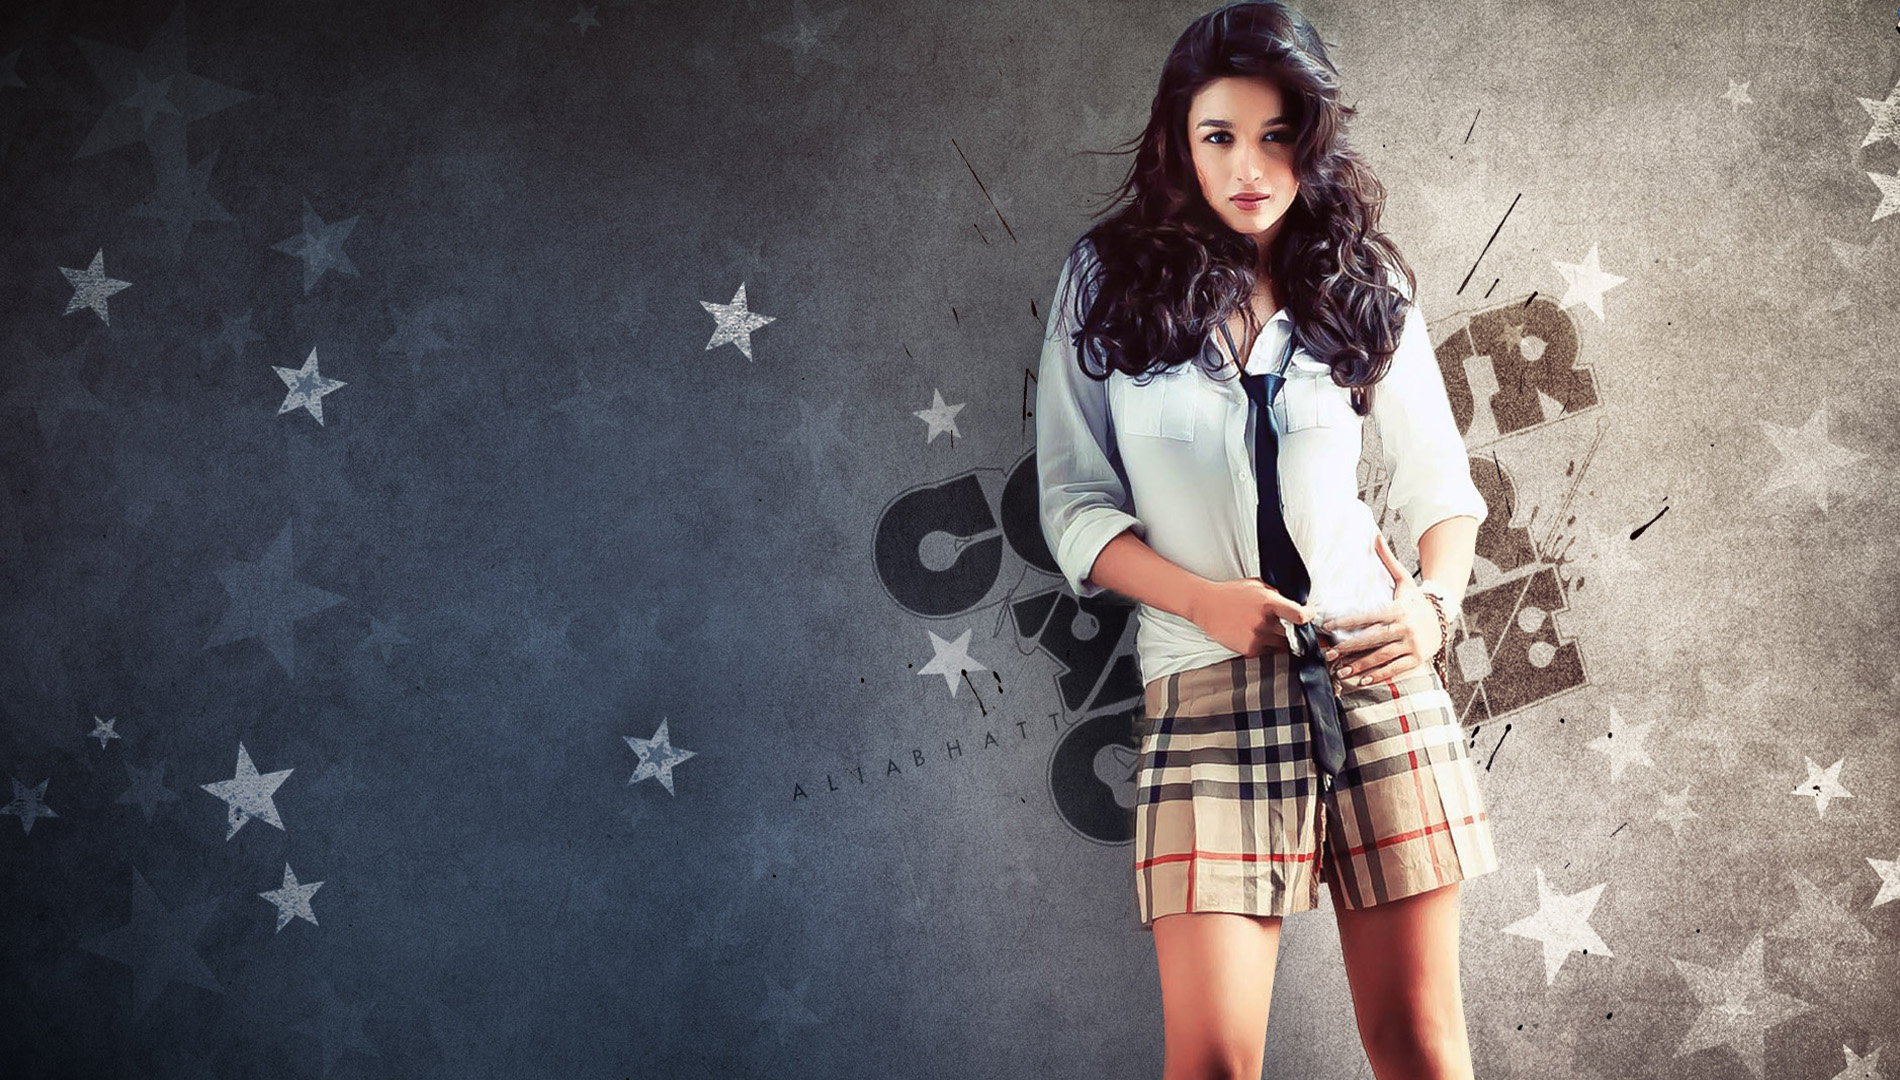 All Bollywood Girl Hd Wallpaper Facebook Covers For Alia Bhatt 49 58 Popopics Com